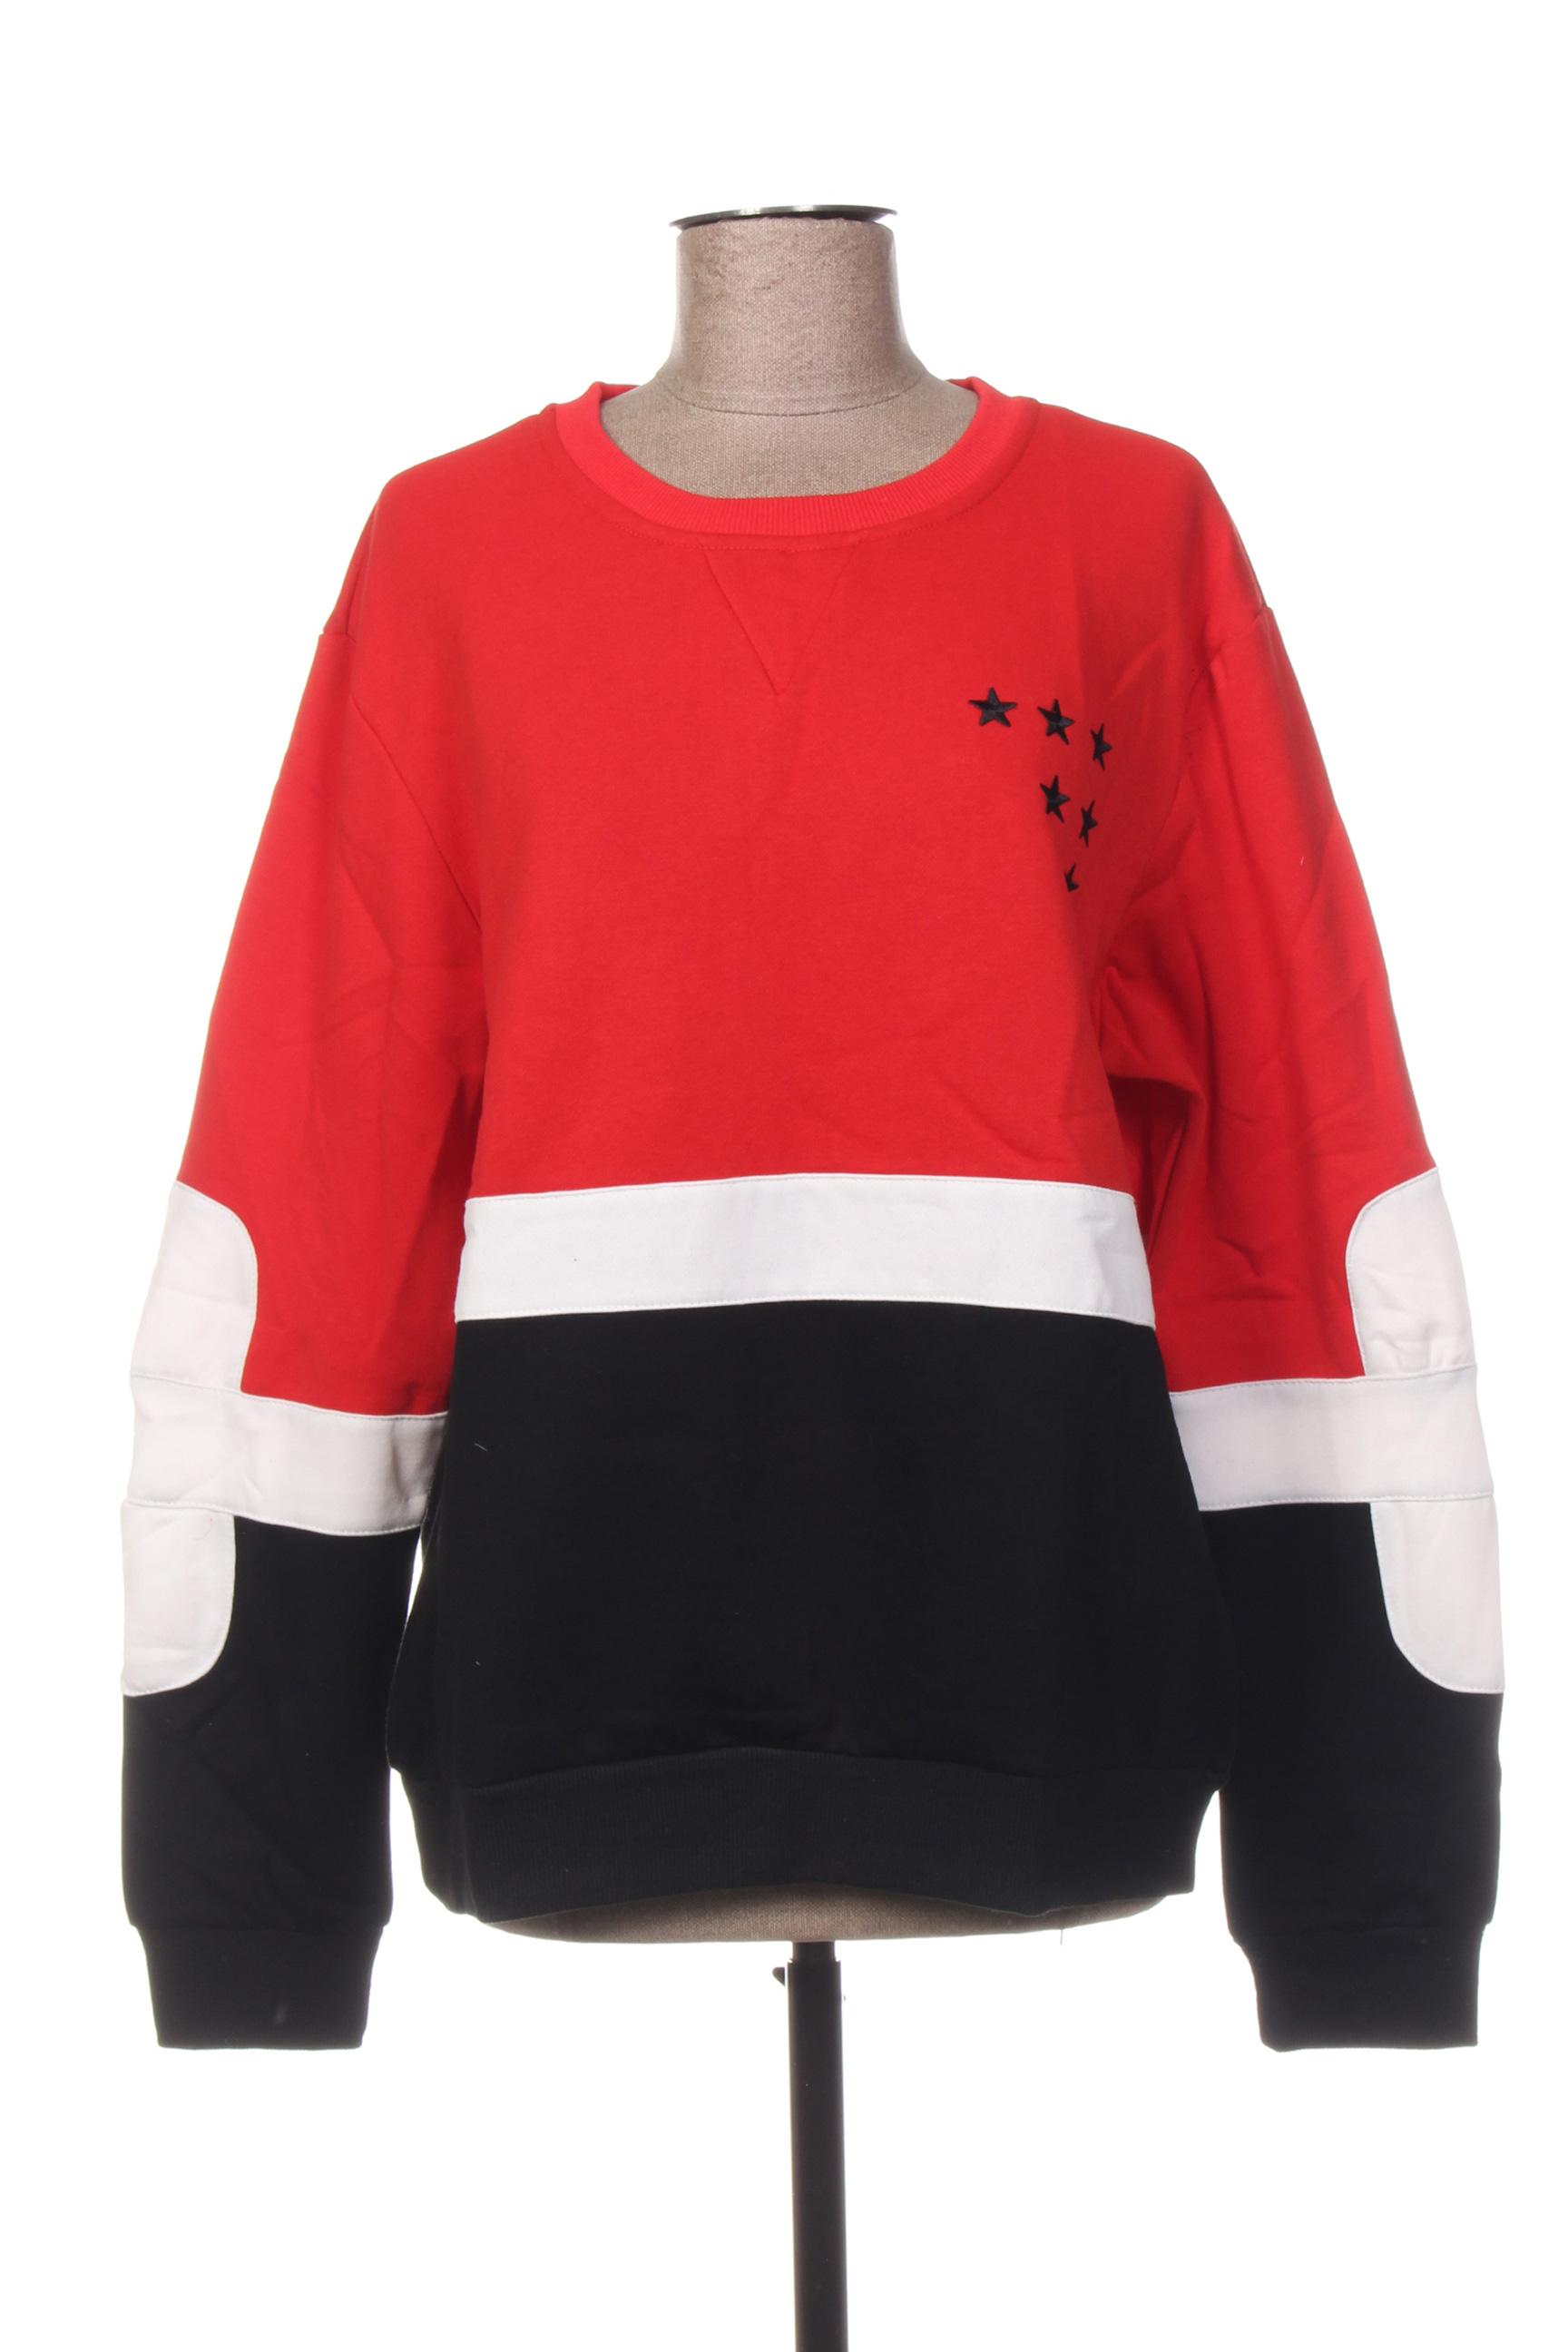 Sweat-shirt femme Geniris rouge taille : 40 12 FR (FR)